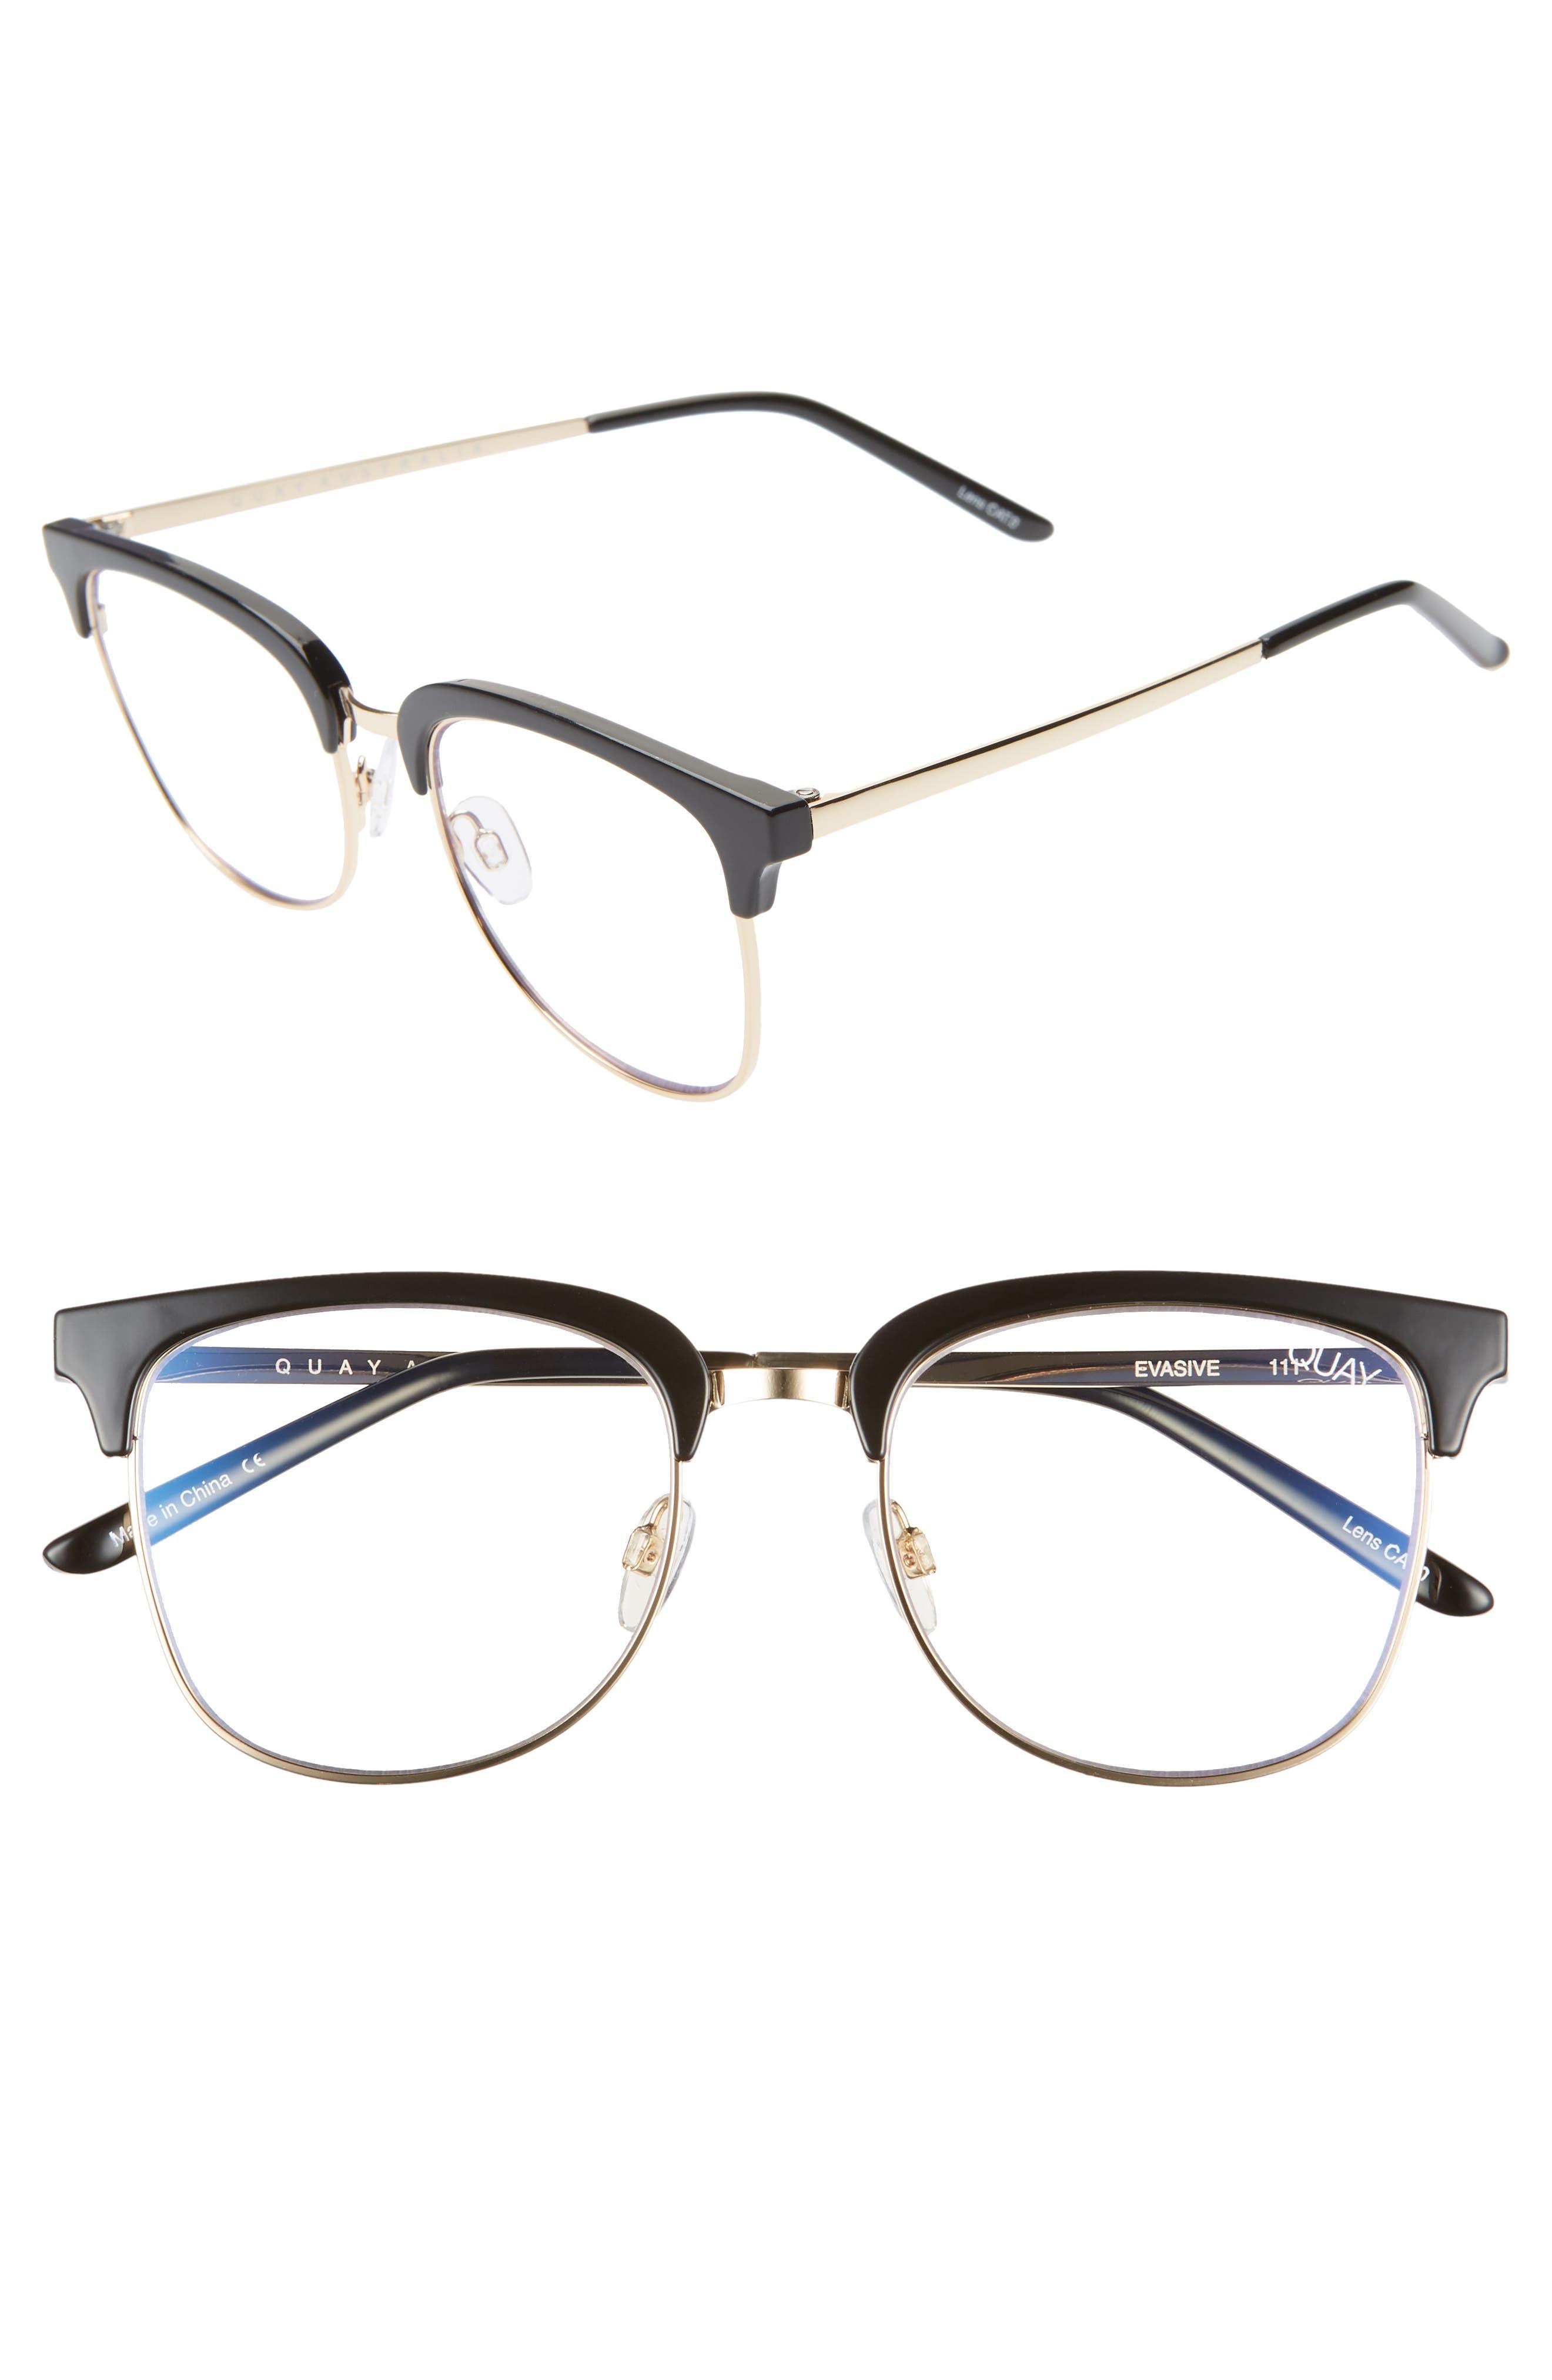 1940s Sunglasses, Glasses & Eyeglasses History Womens Quay Australia Evasive 52Mm Blue Light Blocking Glasses - $60.00 AT vintagedancer.com